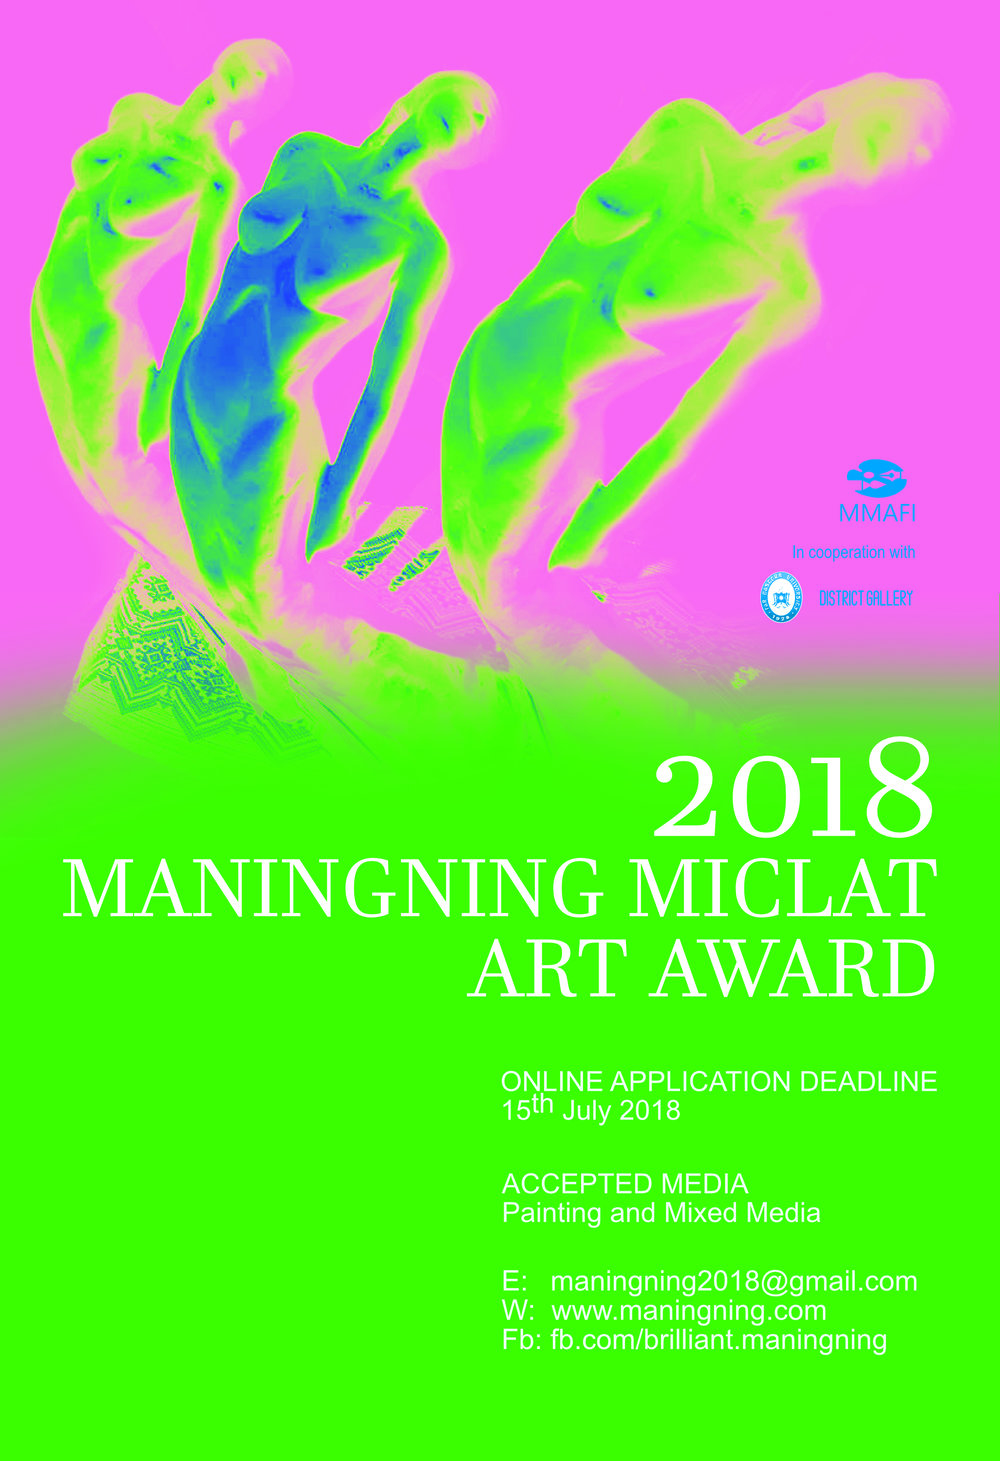 Maningning Miclat Art Award final final.jpg